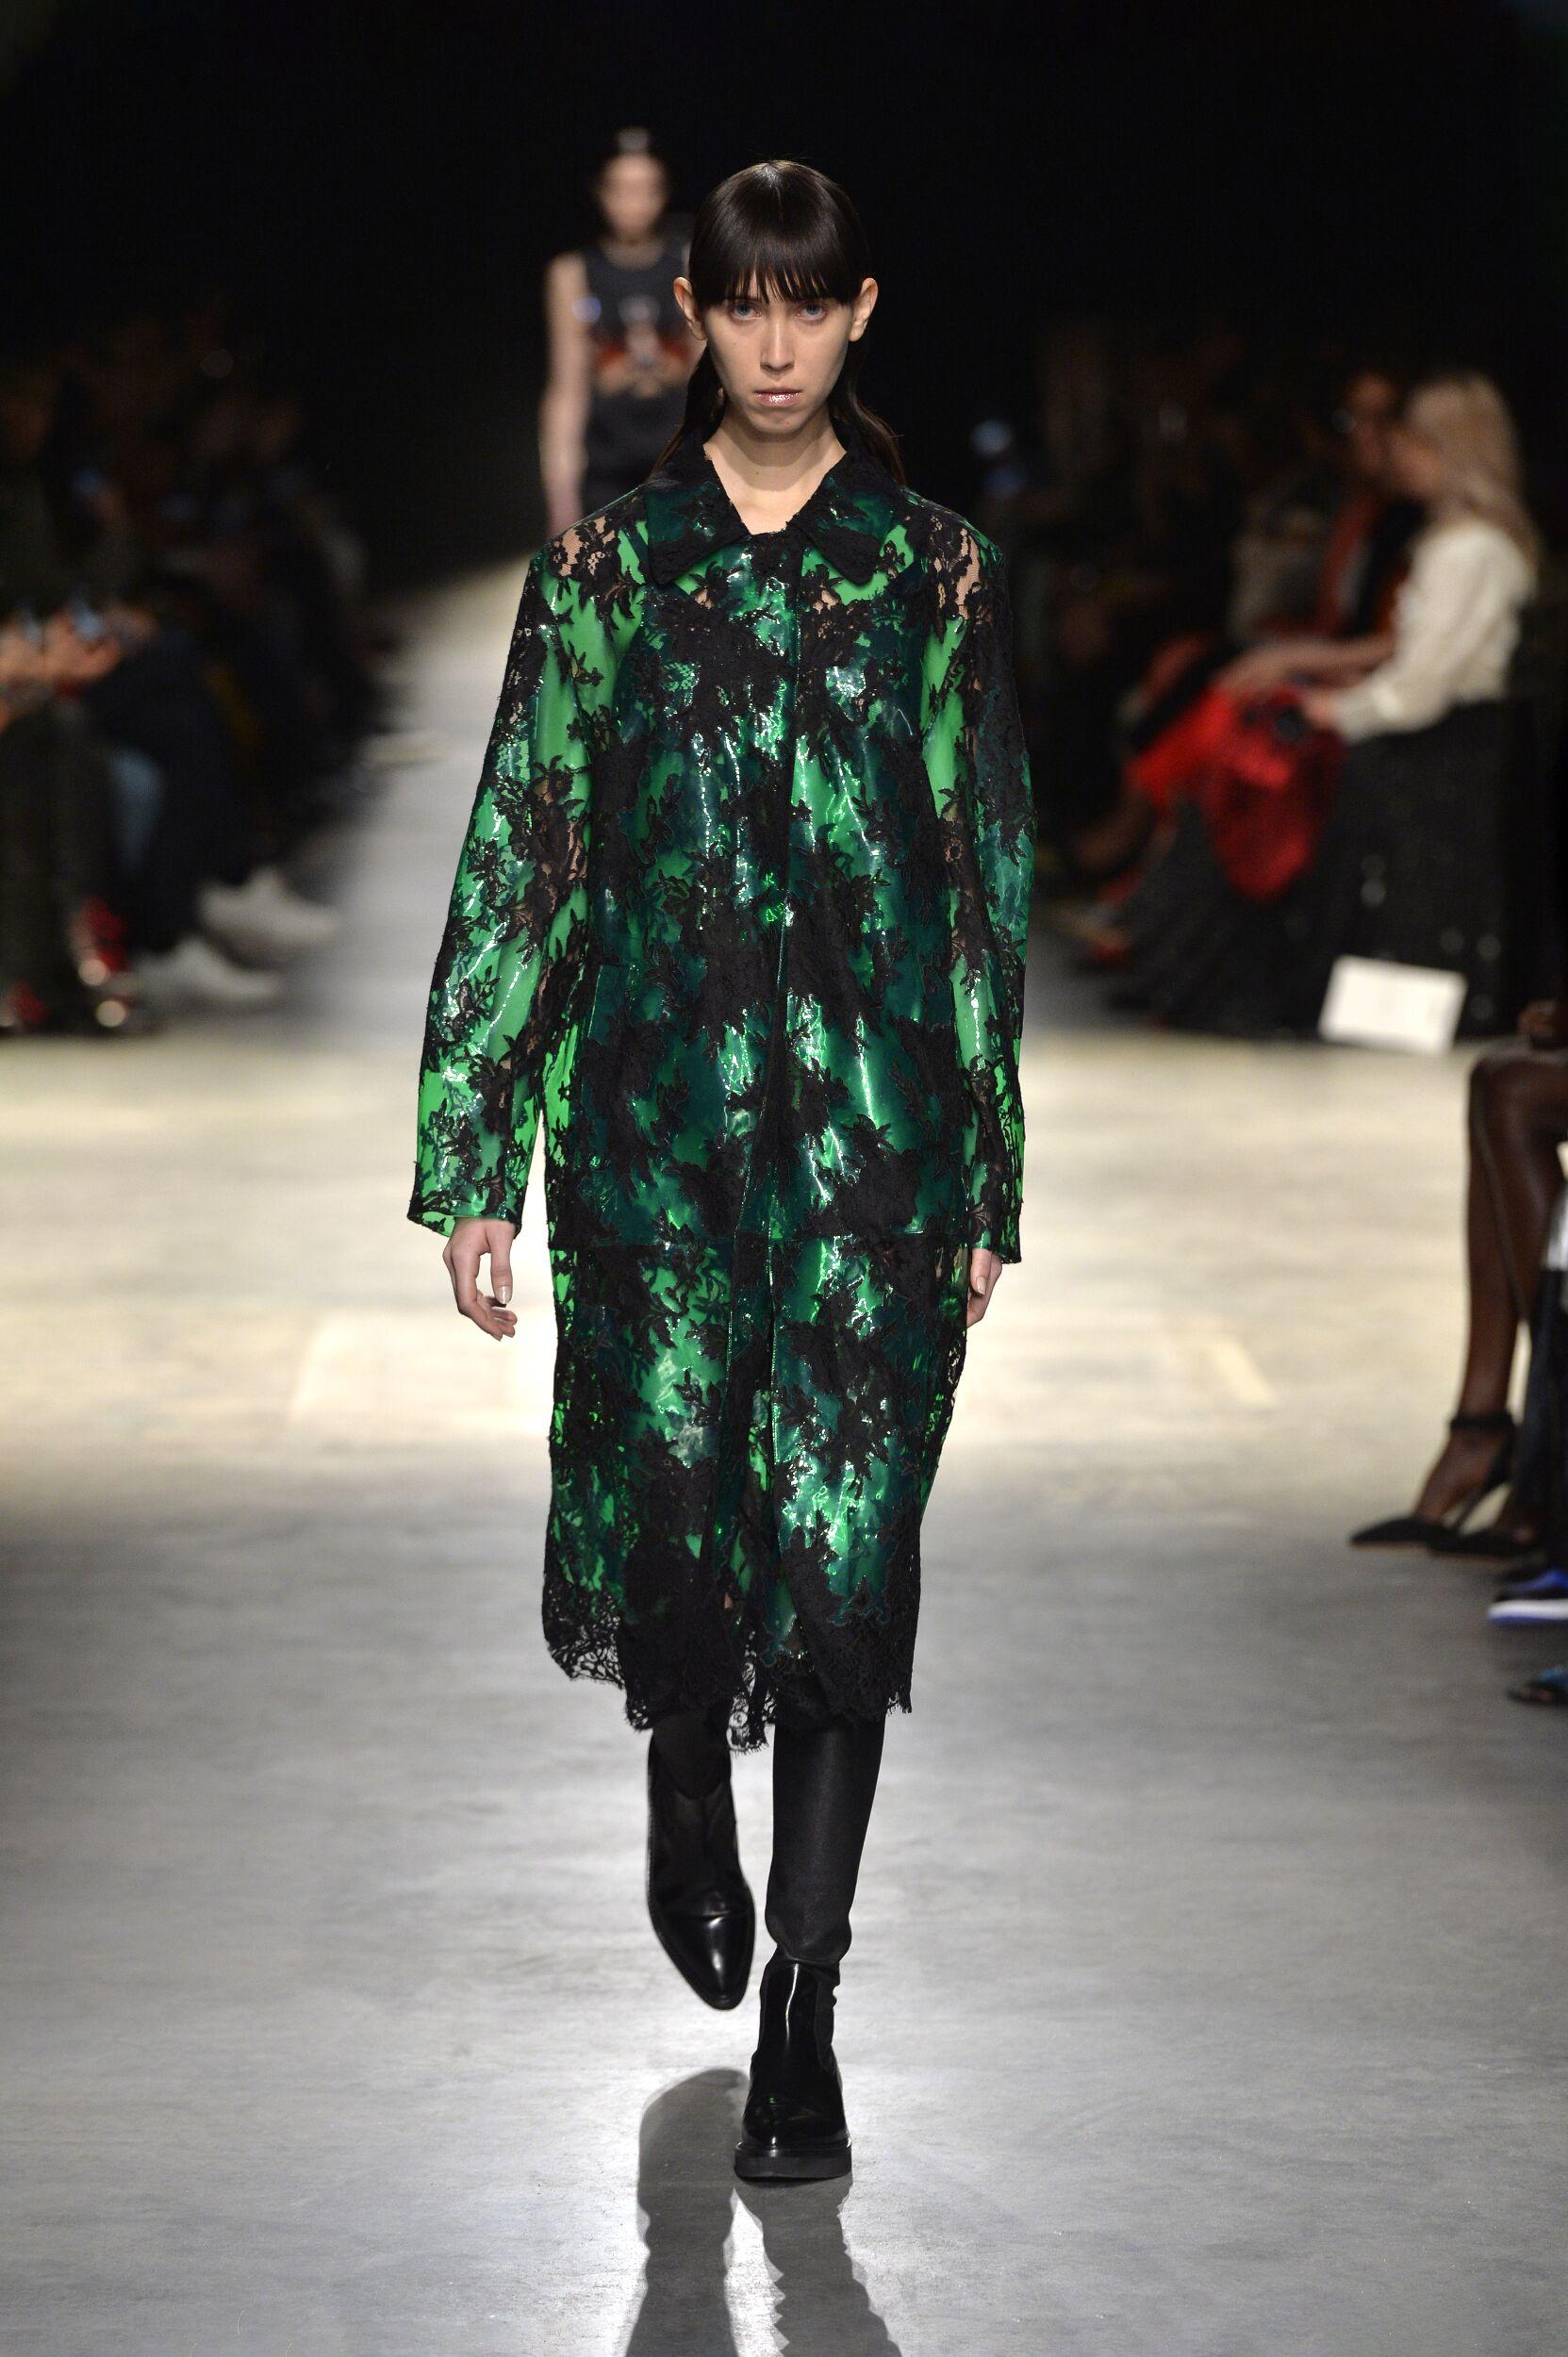 Christopher Kane FW 2020 Womenswear